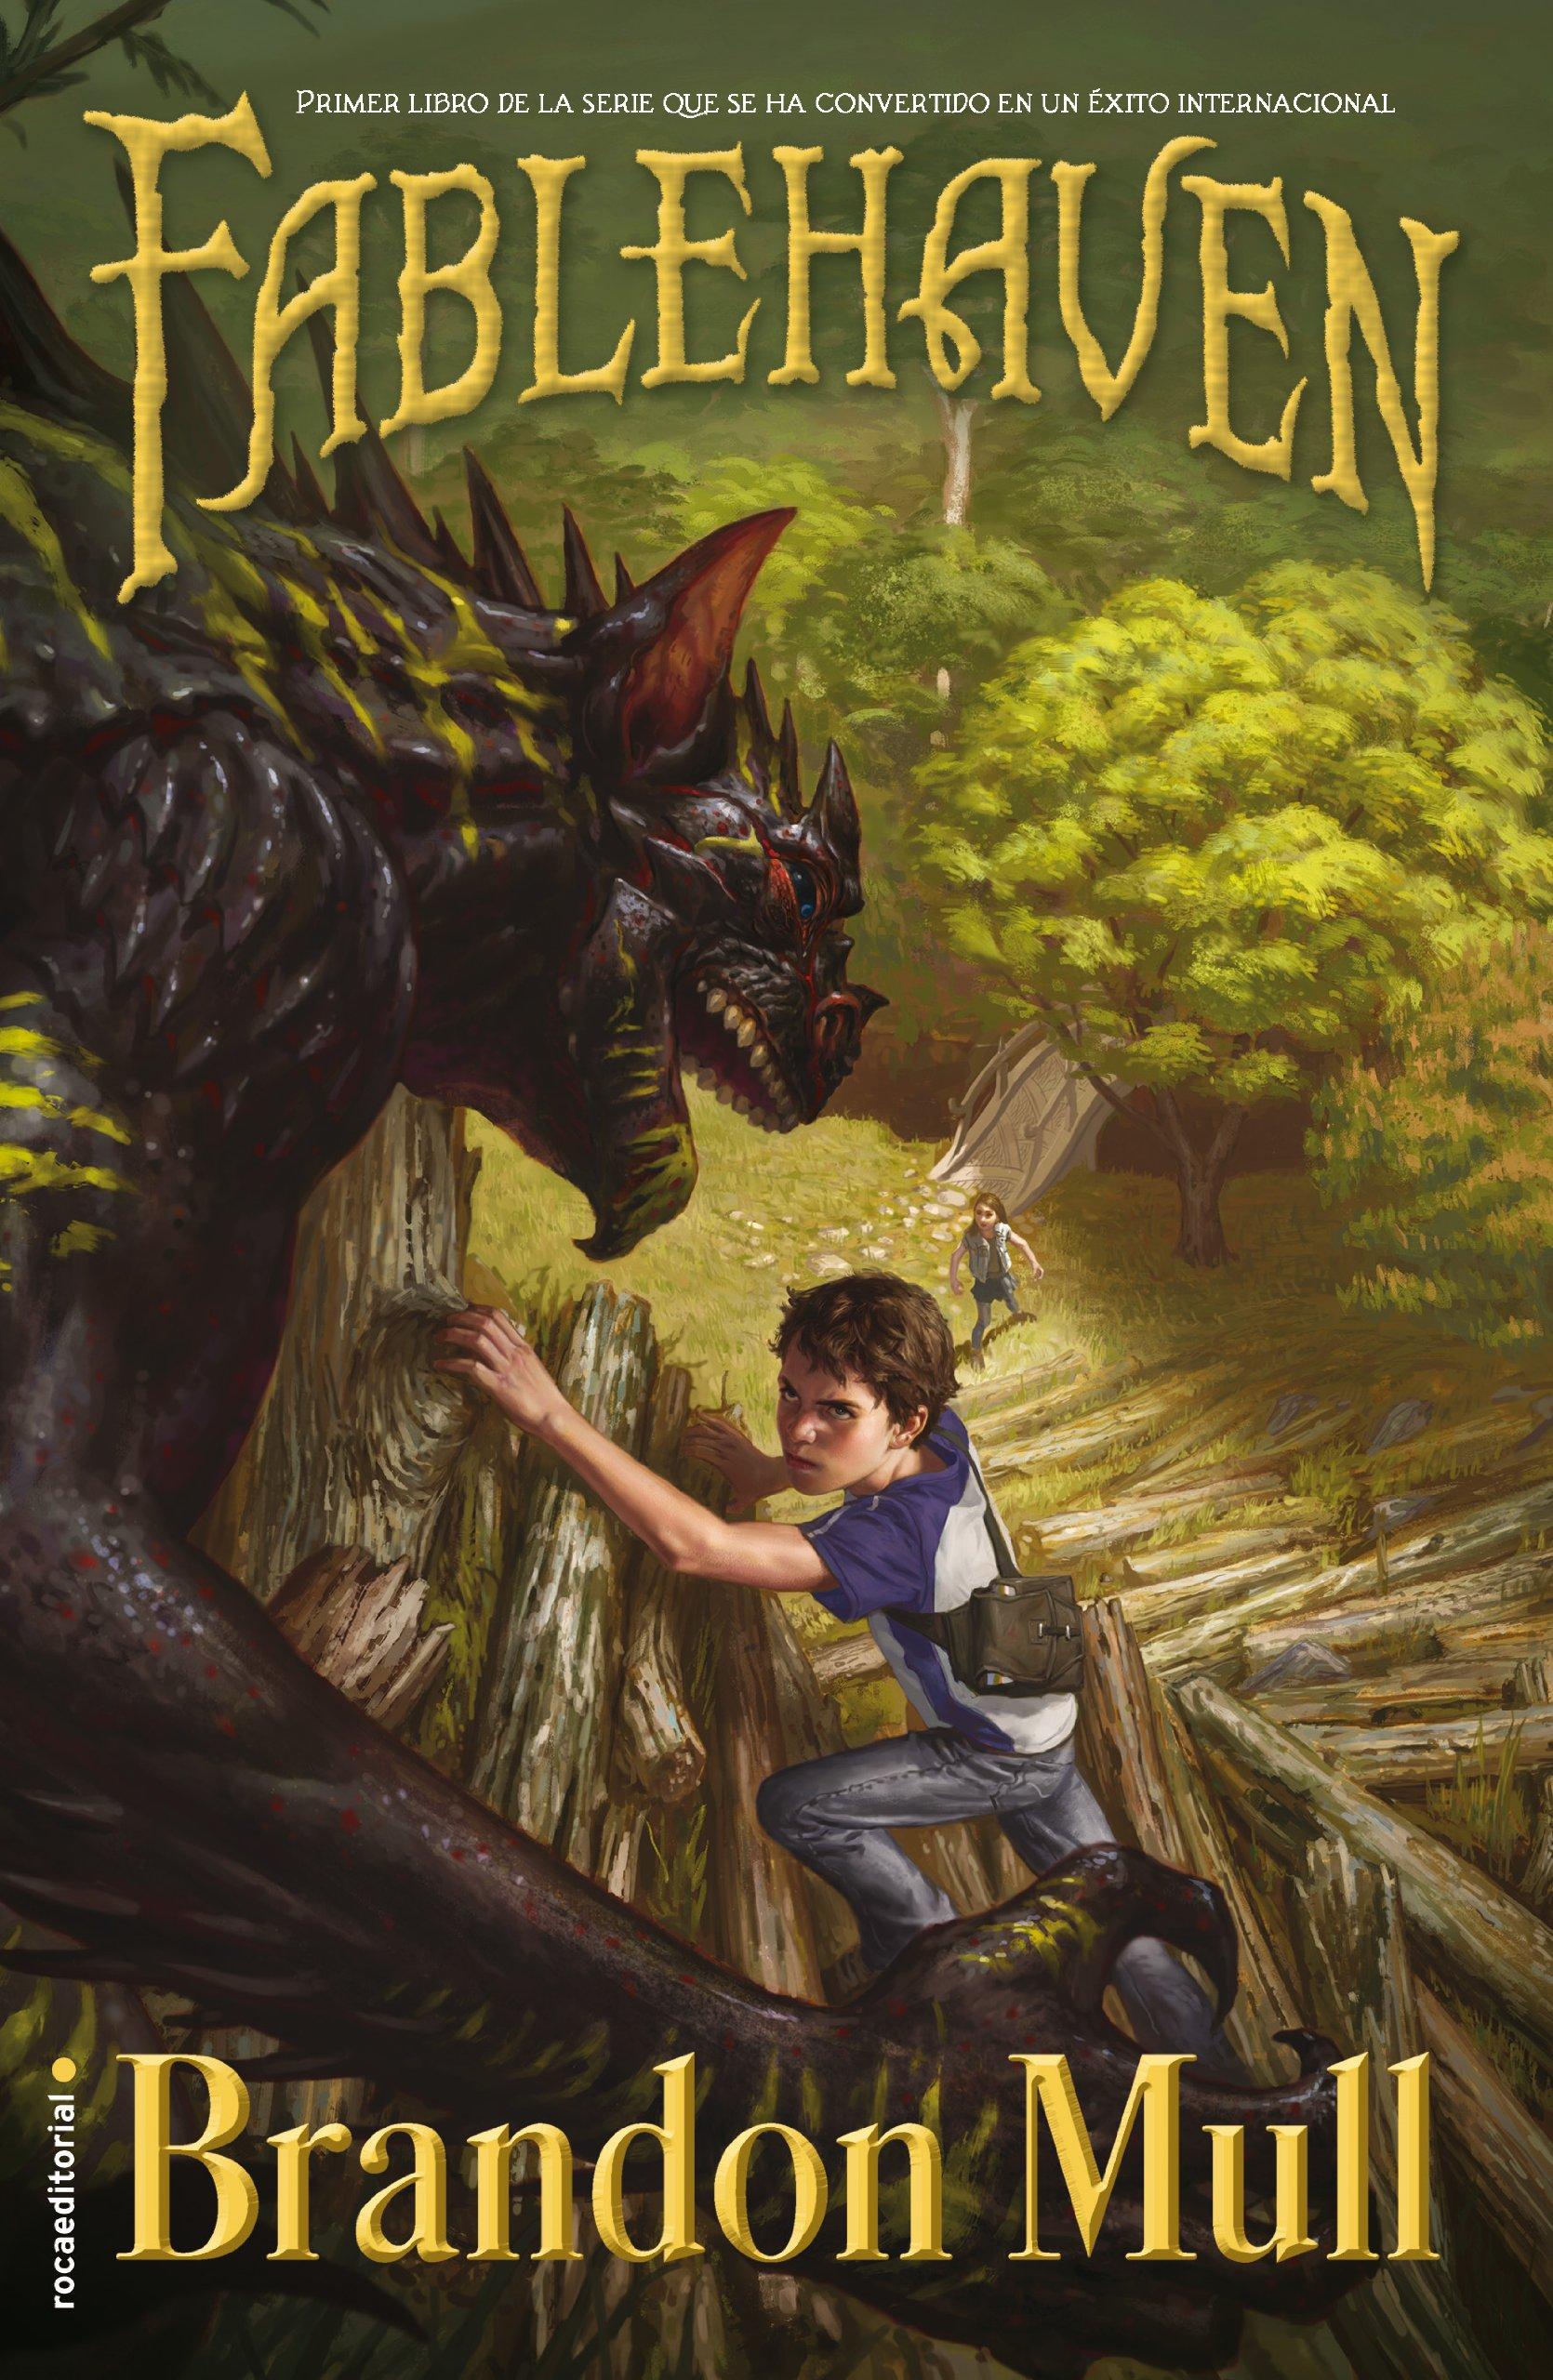 Fablehaven: Libro I (Junior - Juvenil (roca)): Amazon.es: Brandon Mull, Inés Belaustegui: Libros